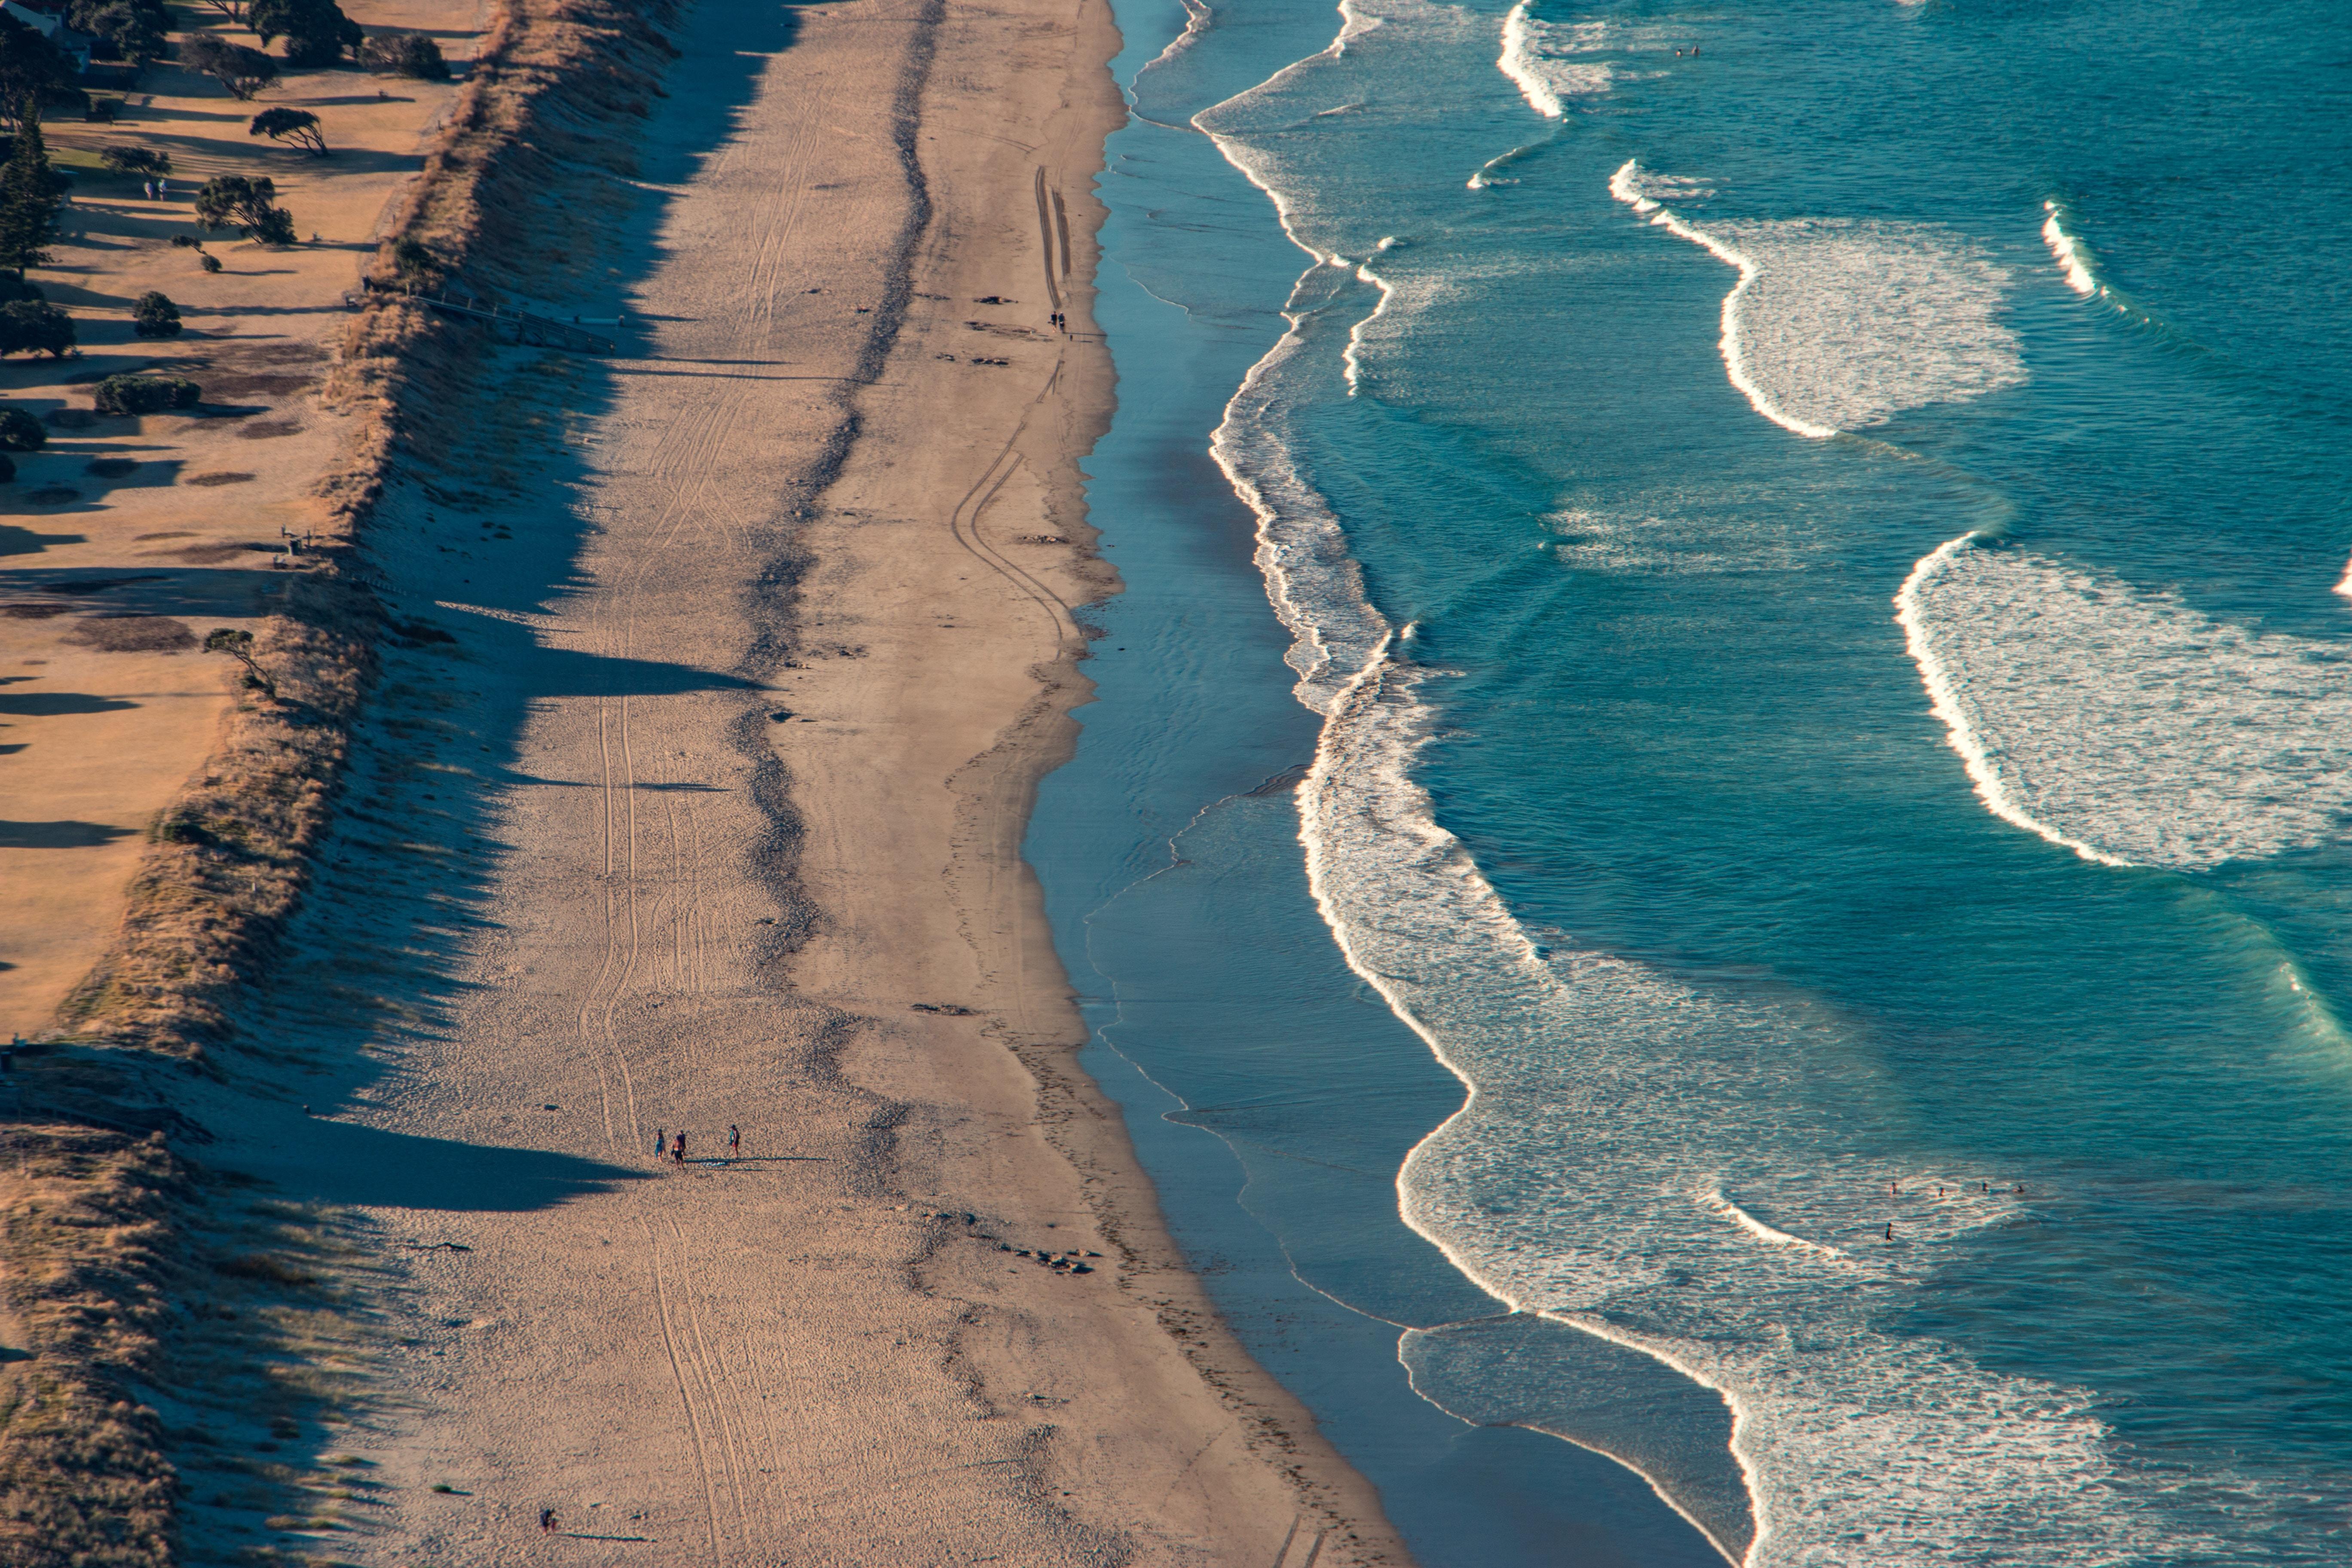 aerial photo of brown sandy beach